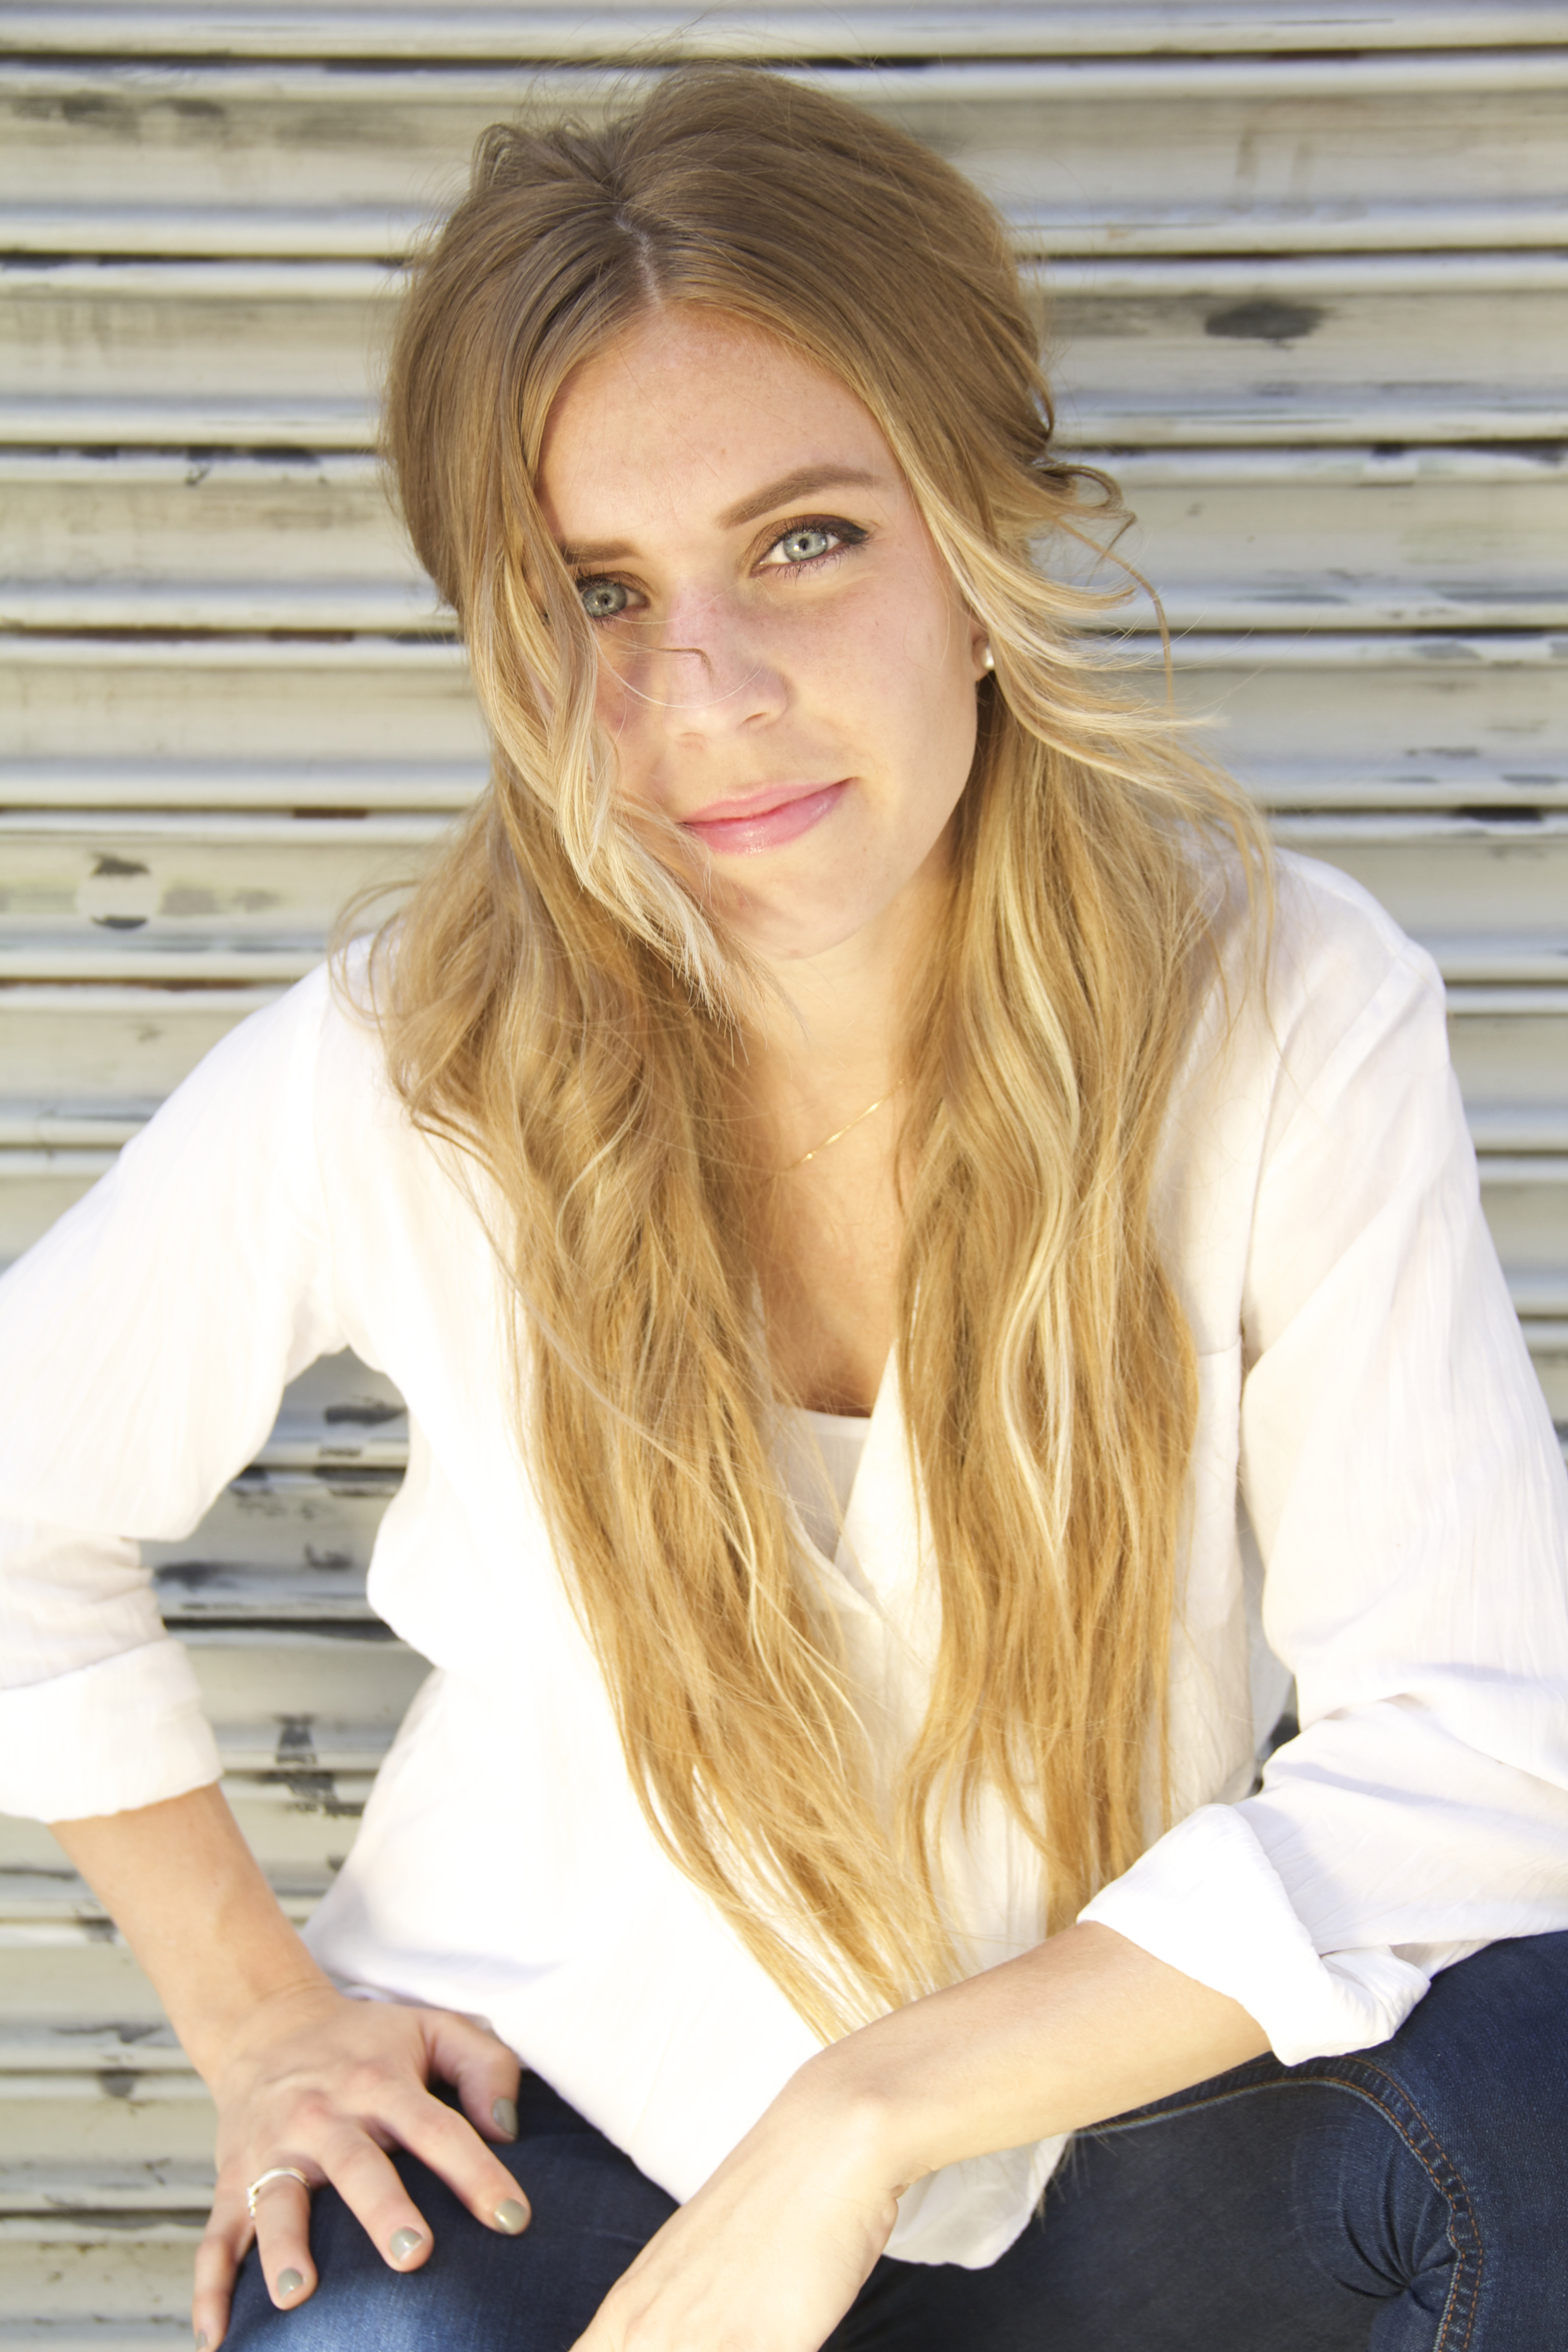 Natalie Stalter